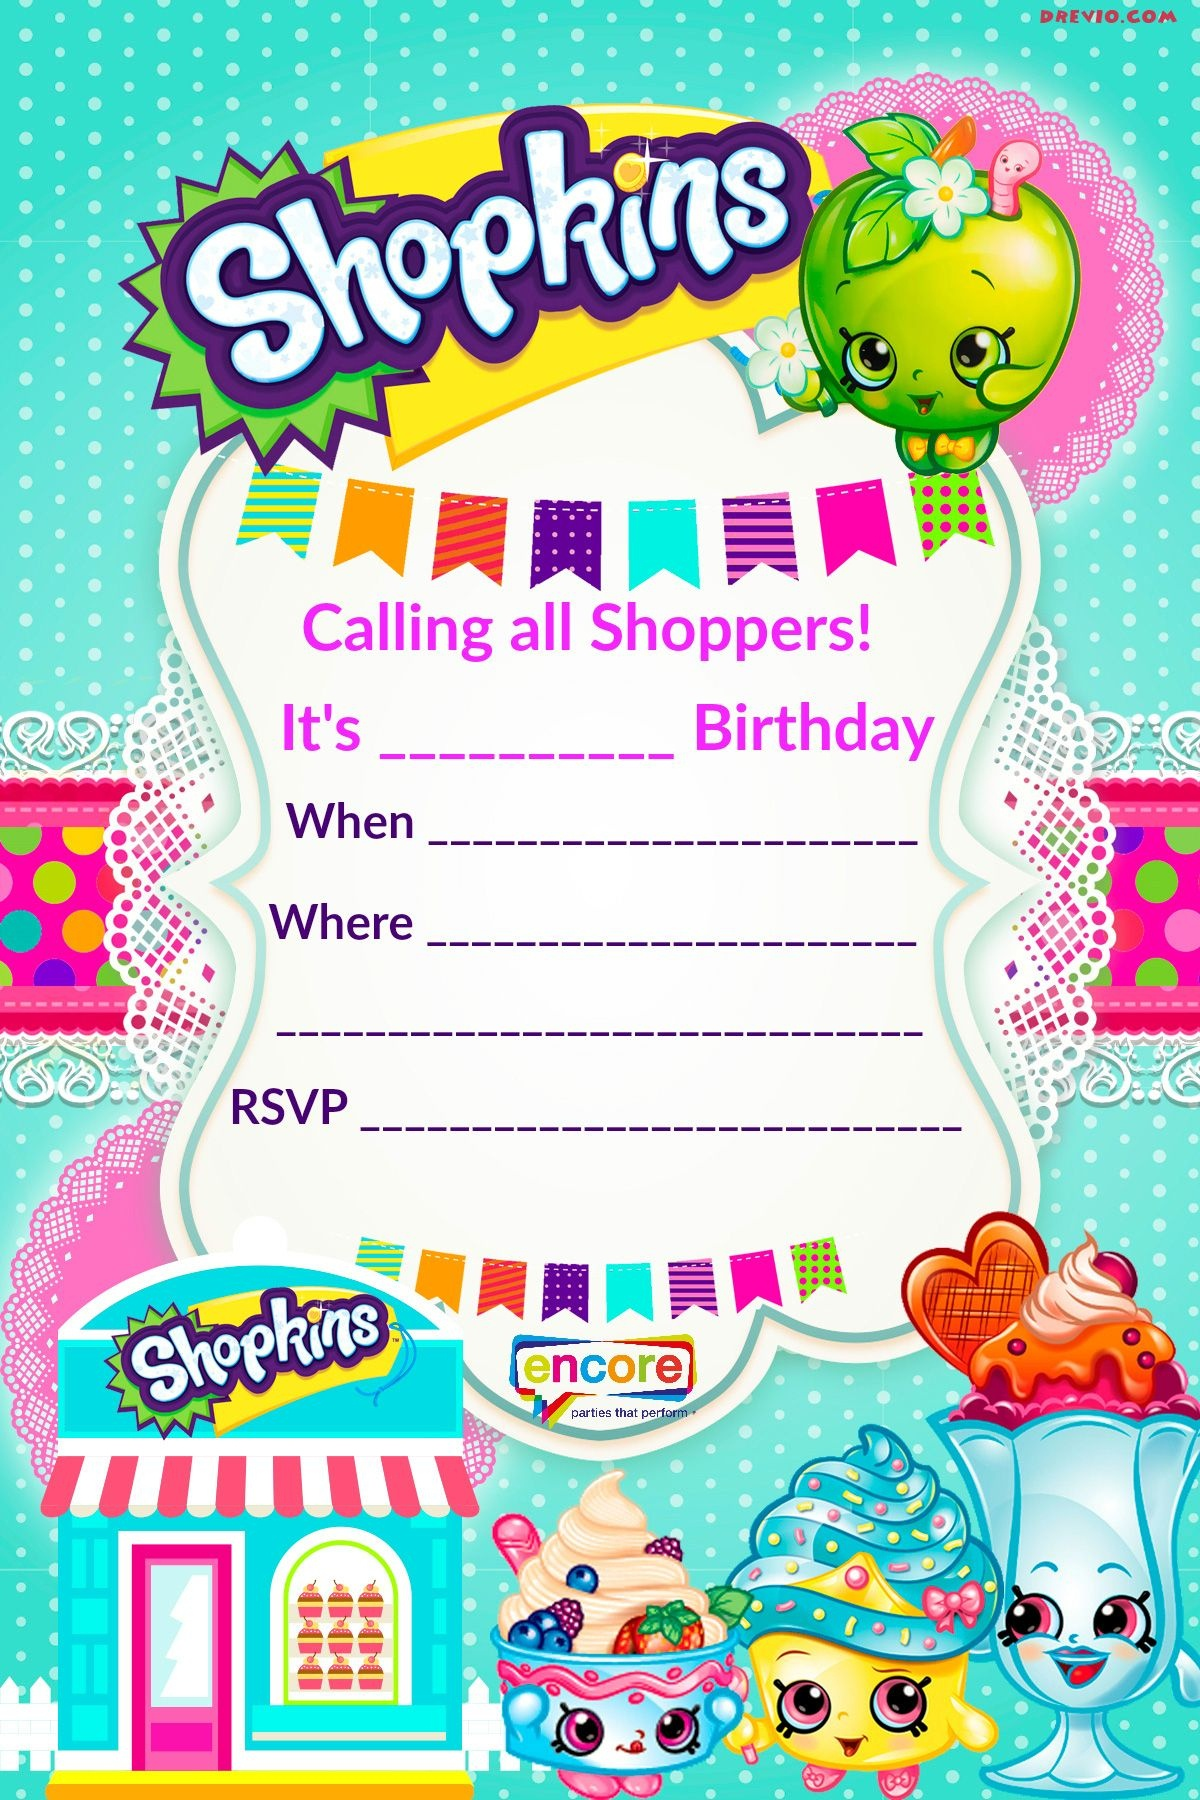 Updated - Free Printable Shopkins Birthday Invitation Template - Free Printable Shopkins Invitations